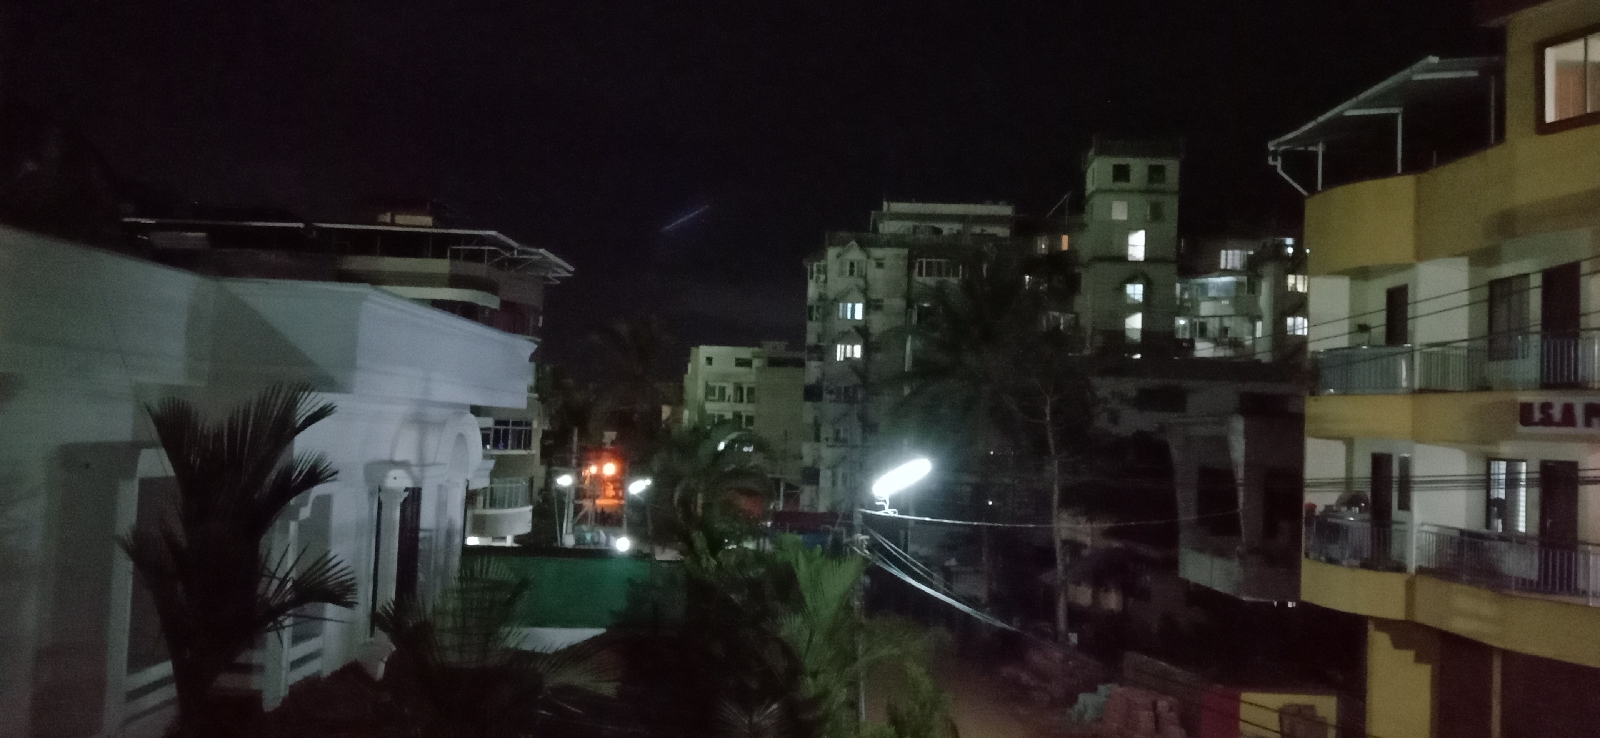 Mangalore- ಲಾಕ್ ಡೌನ್ ಸಡಿಲಿಕೆ- 6 ರಿಂದ 5 ಗಂಟೆ ಅವಕಾಶ- ಇರುತ್ತೆ ವೀಕೆಂಡ್ ಕರ್ಪ್ಯೂ!